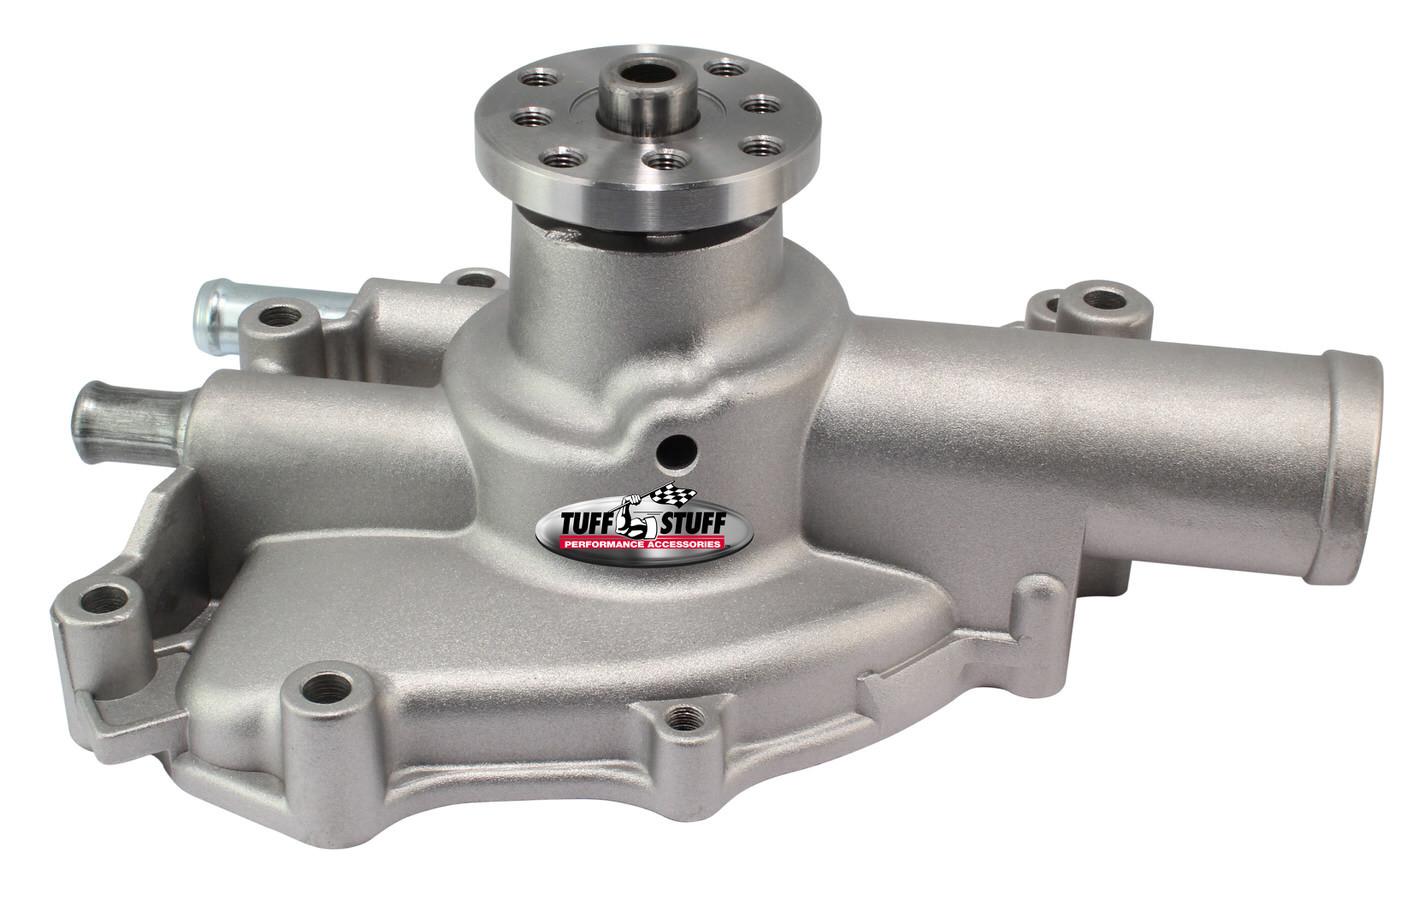 Tuff-Stuff 1625NJ Water Pump, Mechanical, Platinum Series, High Volume, Shorty, Aluminum, Natural, Small Block Ford, Each